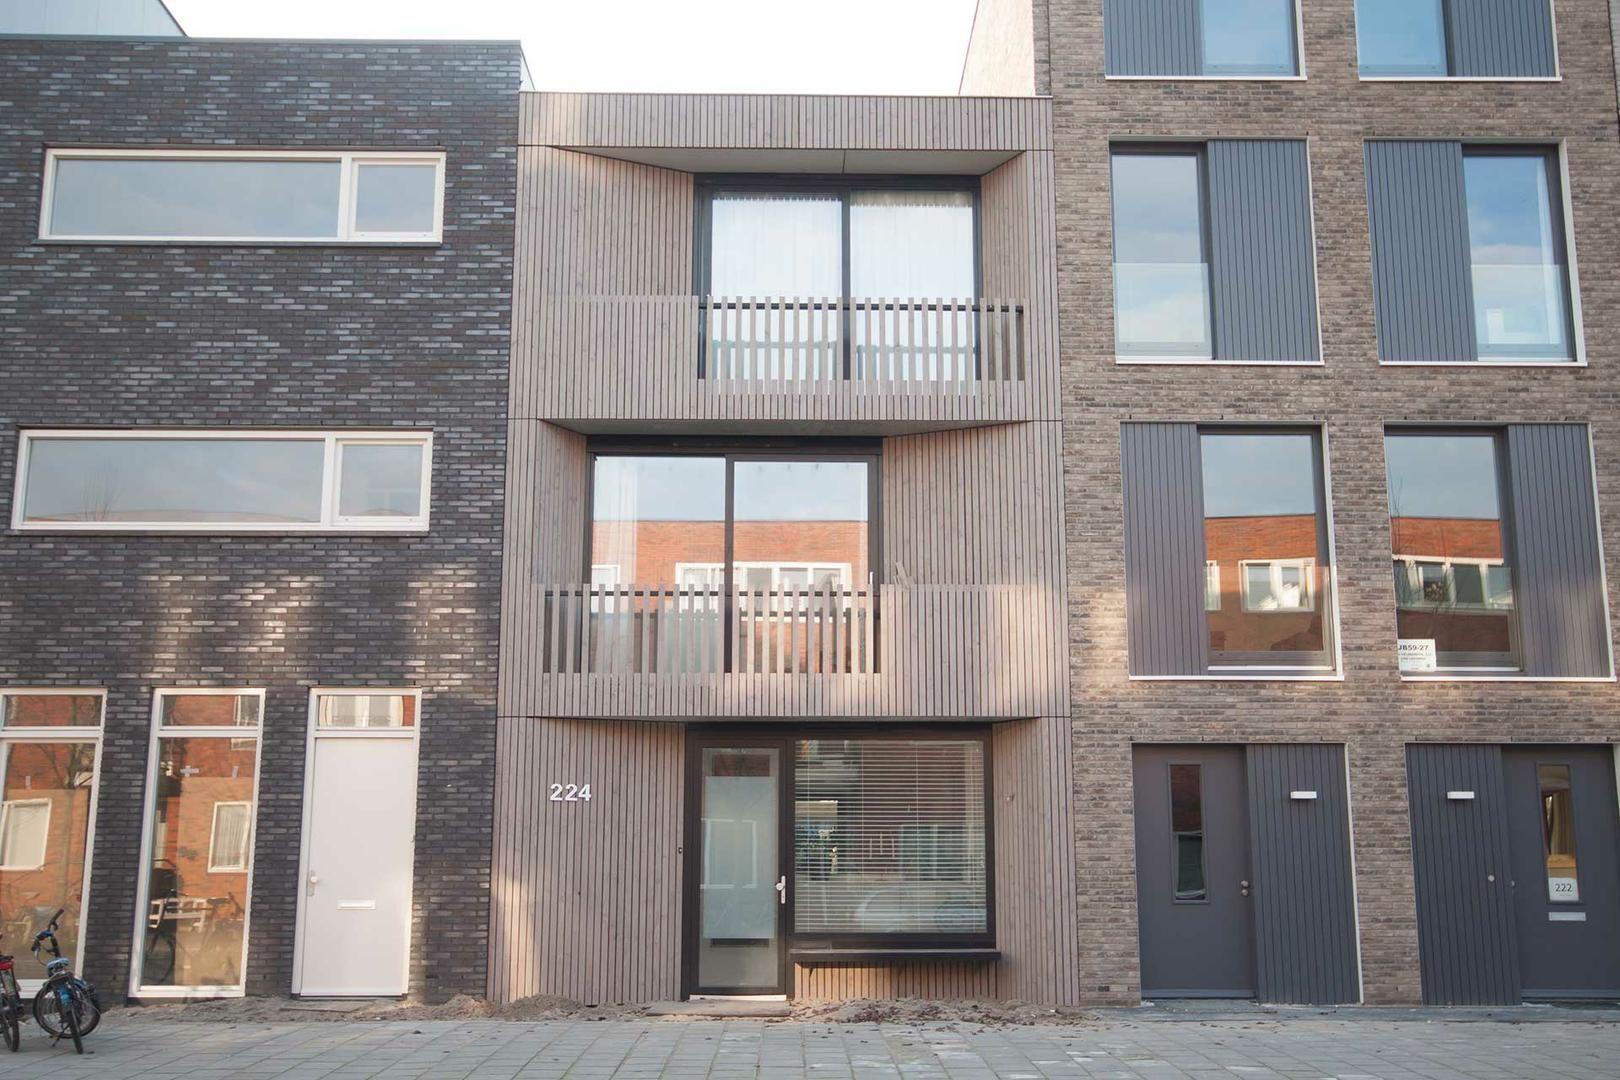 Loggia Bilder loggia house ijburg blok 59 amsterdam ontworpen door designed